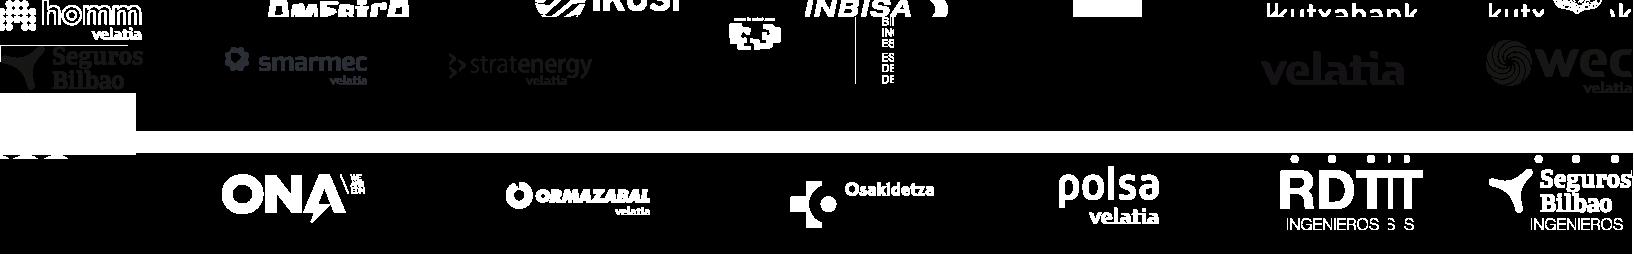 Logos_web_2020_4